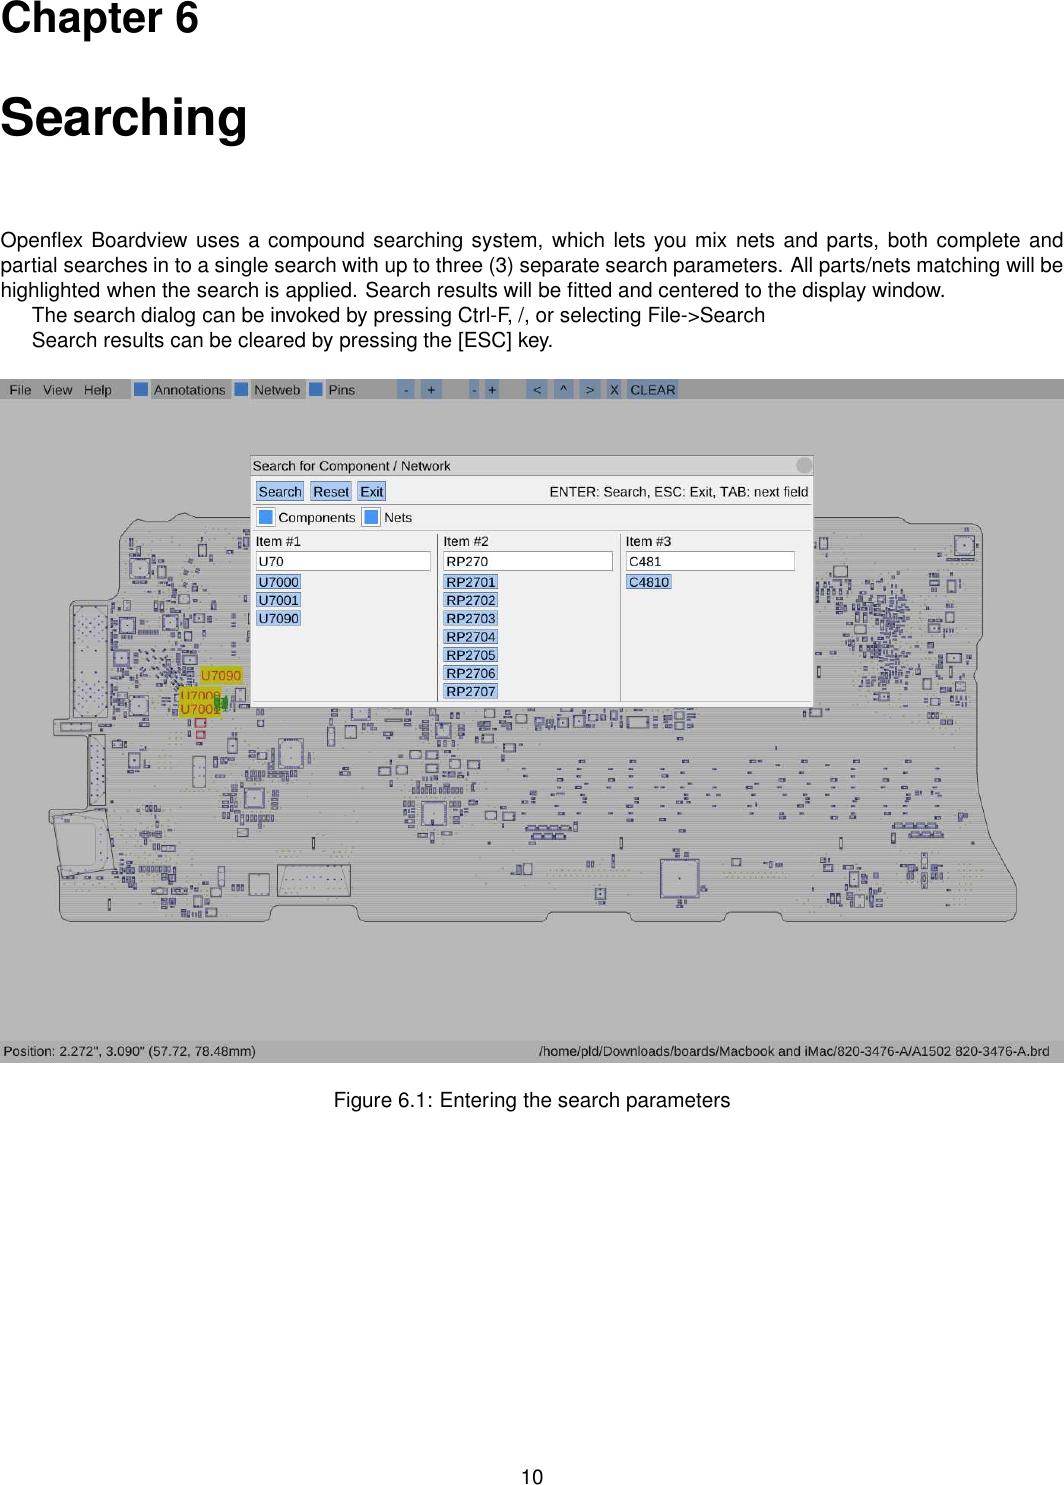 Openflex boardview manual dvi manual